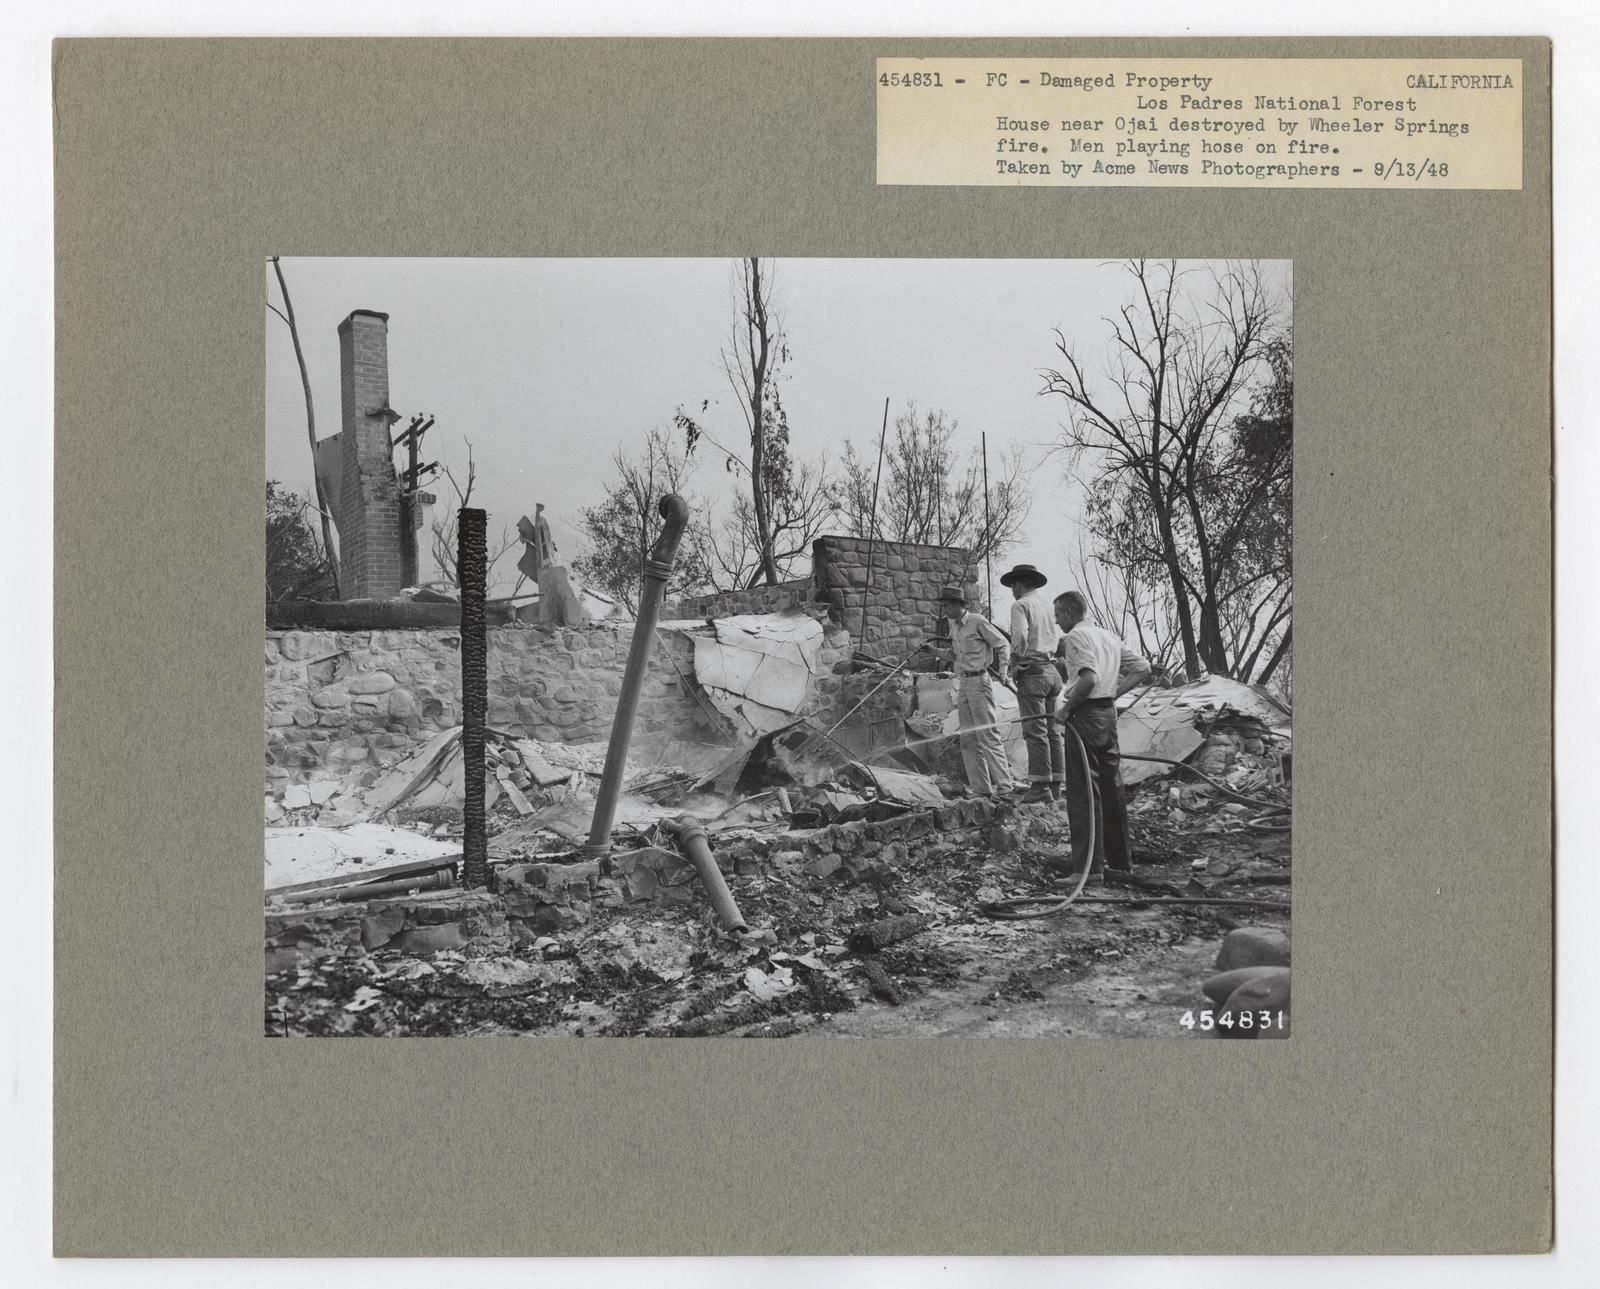 Damaged Properties - California